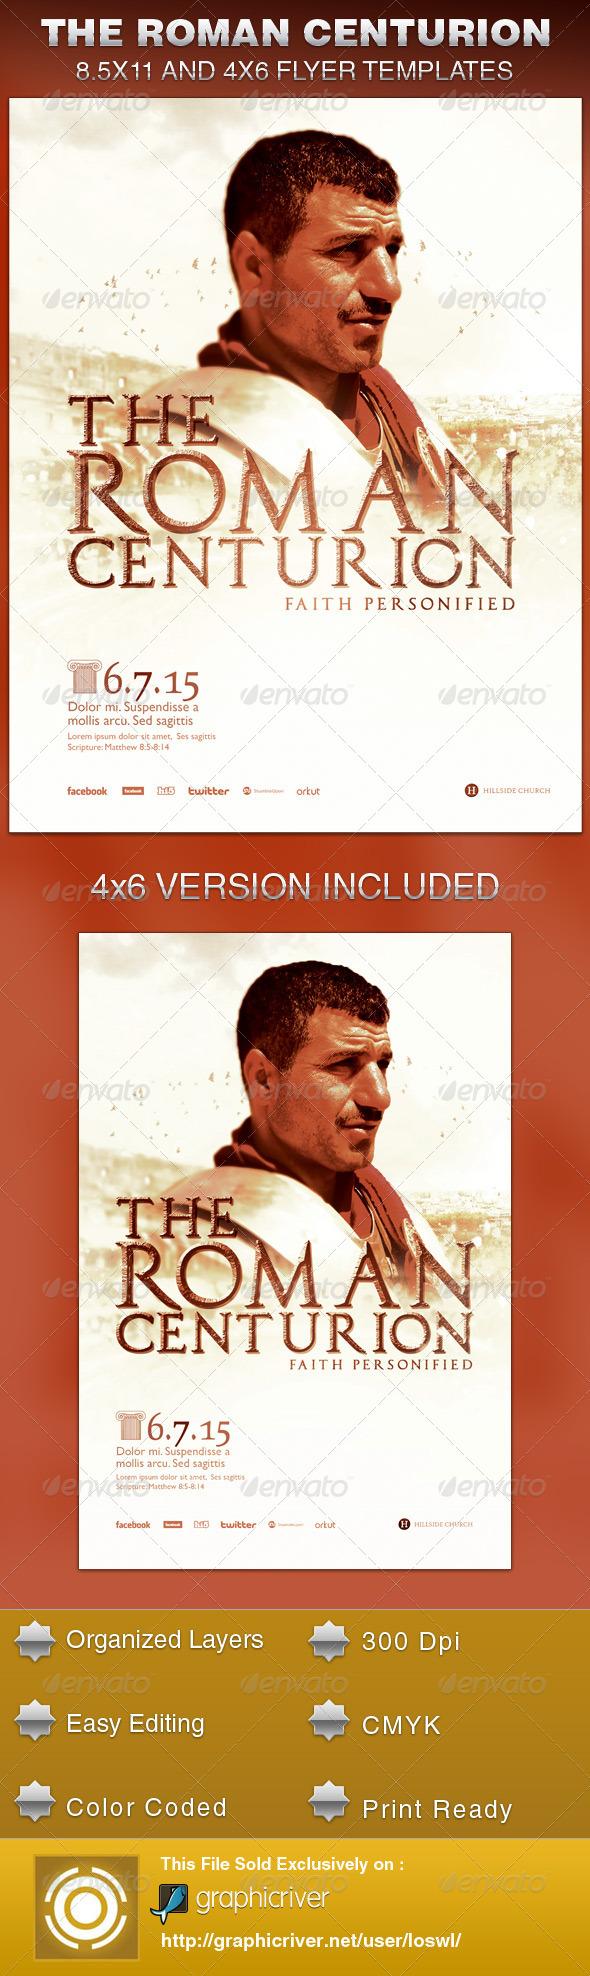 GraphicRiver The Roman Centurion Church Flyer Template 6307330